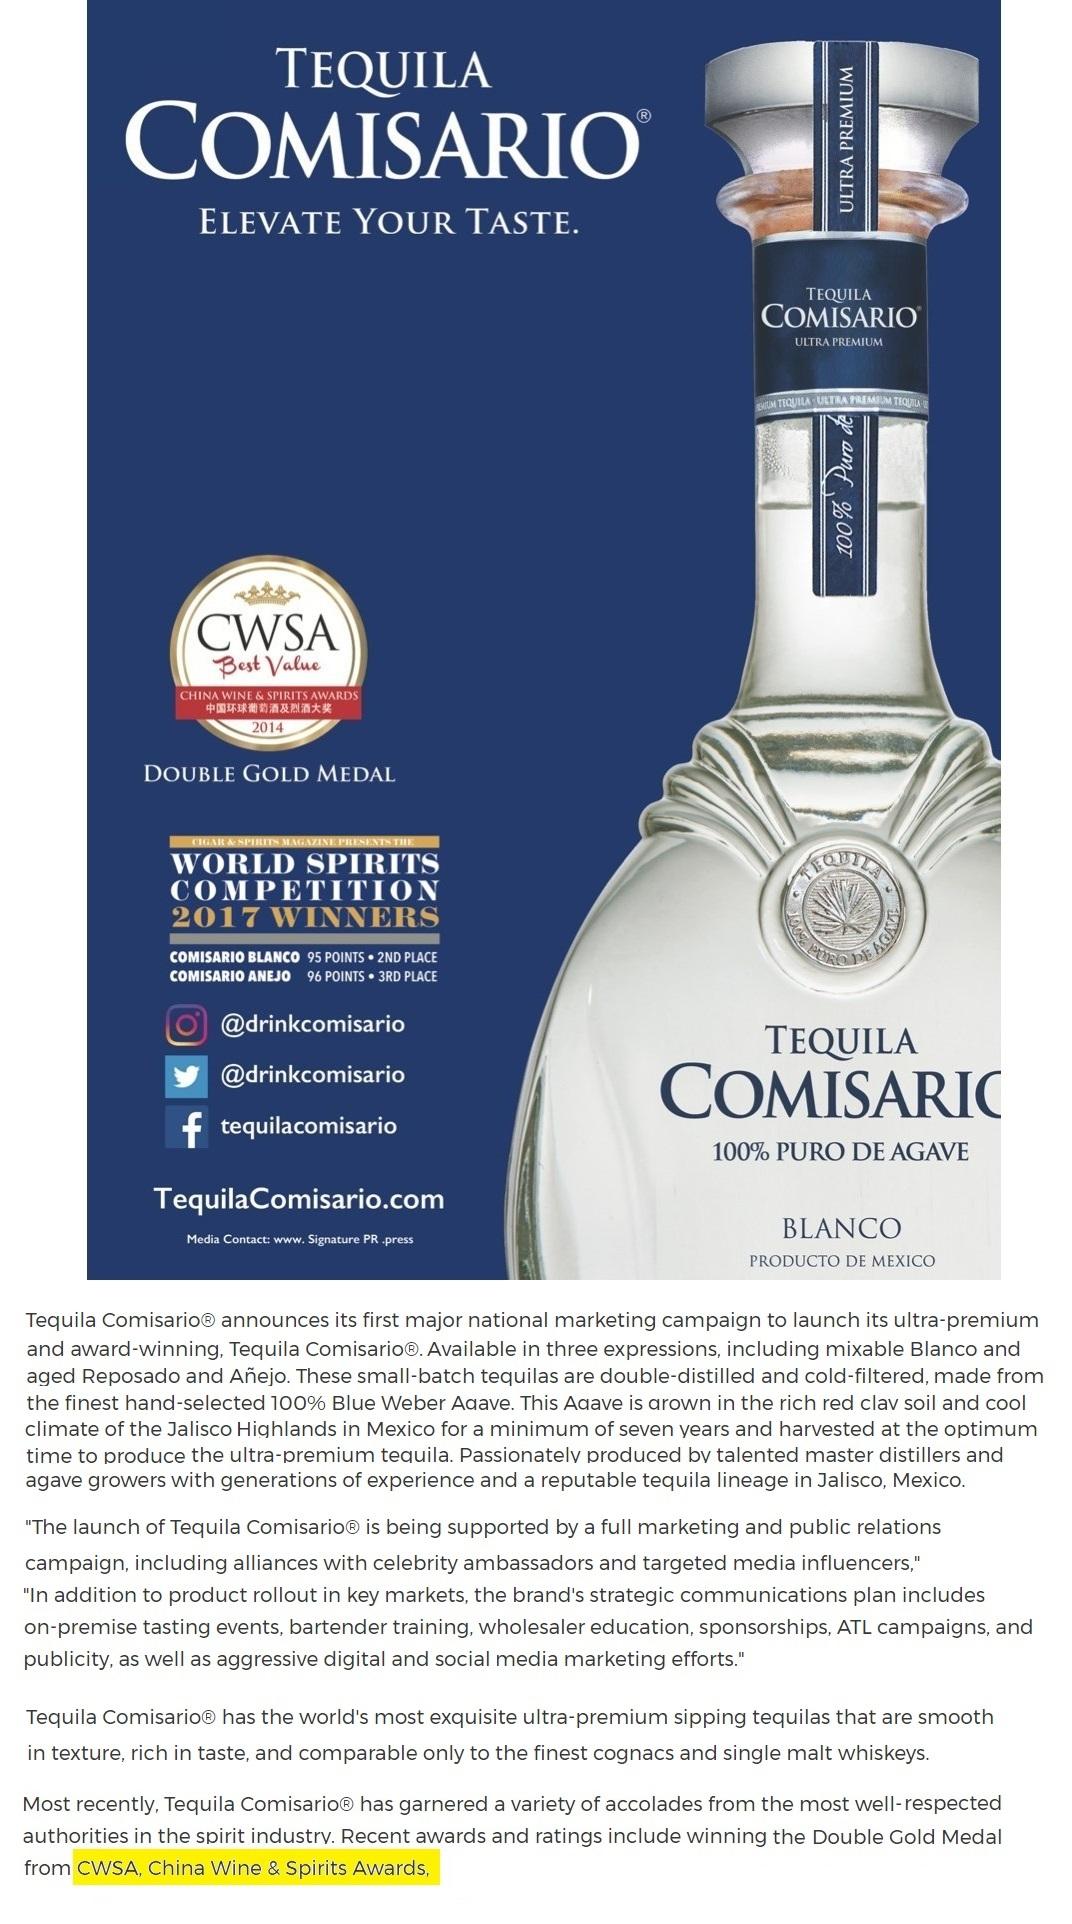 CWSA Winner Tequila Comisario - CWSA | China Wine & Spirits